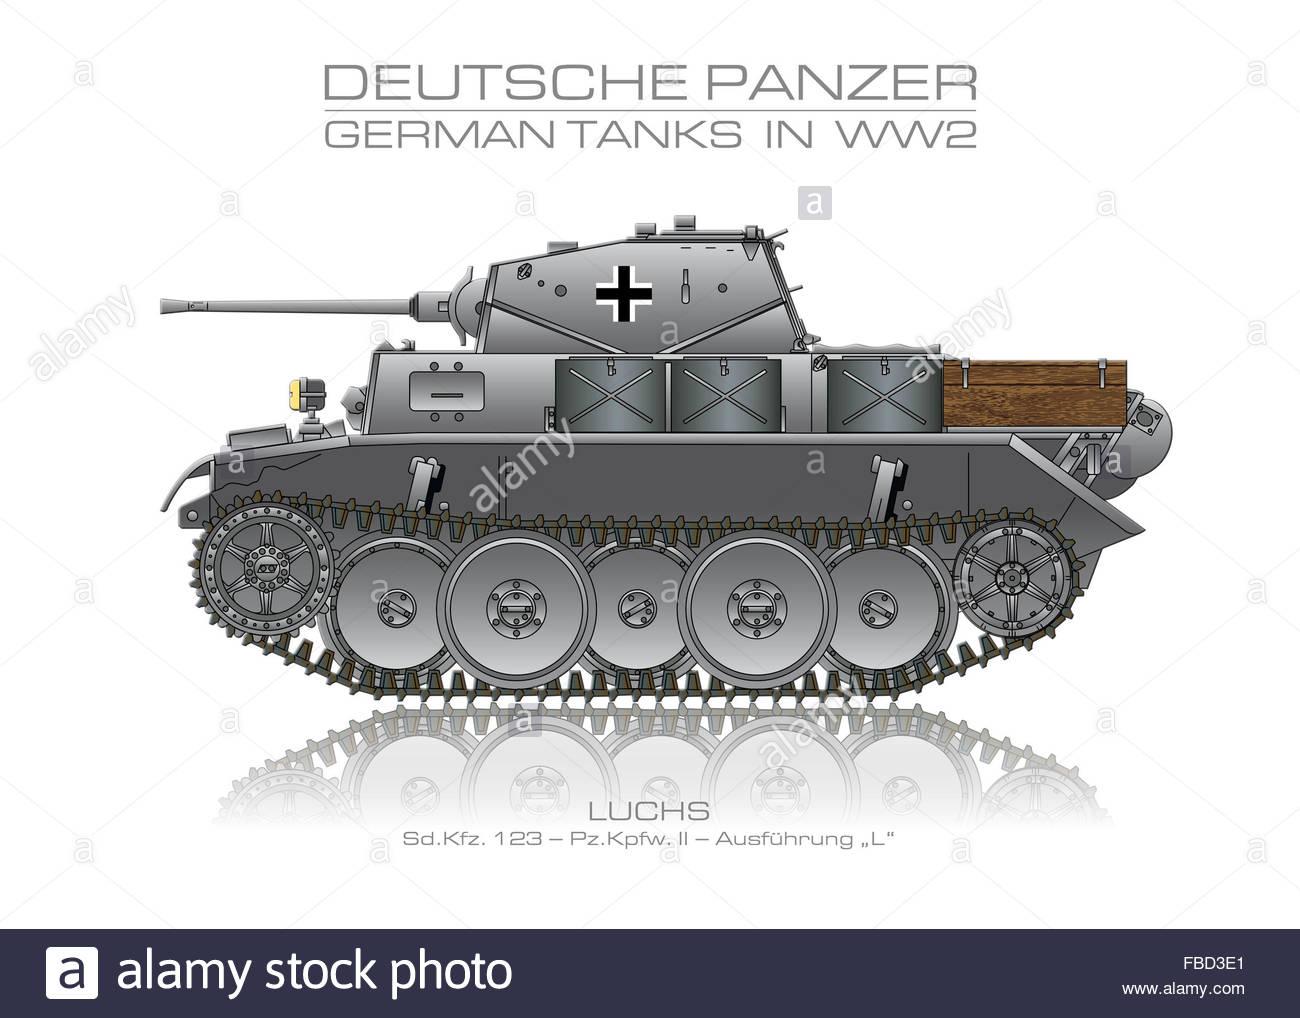 Erfreut Pennsylvania Panzer Traktor Schaltplan Ideen - Elektrische ...